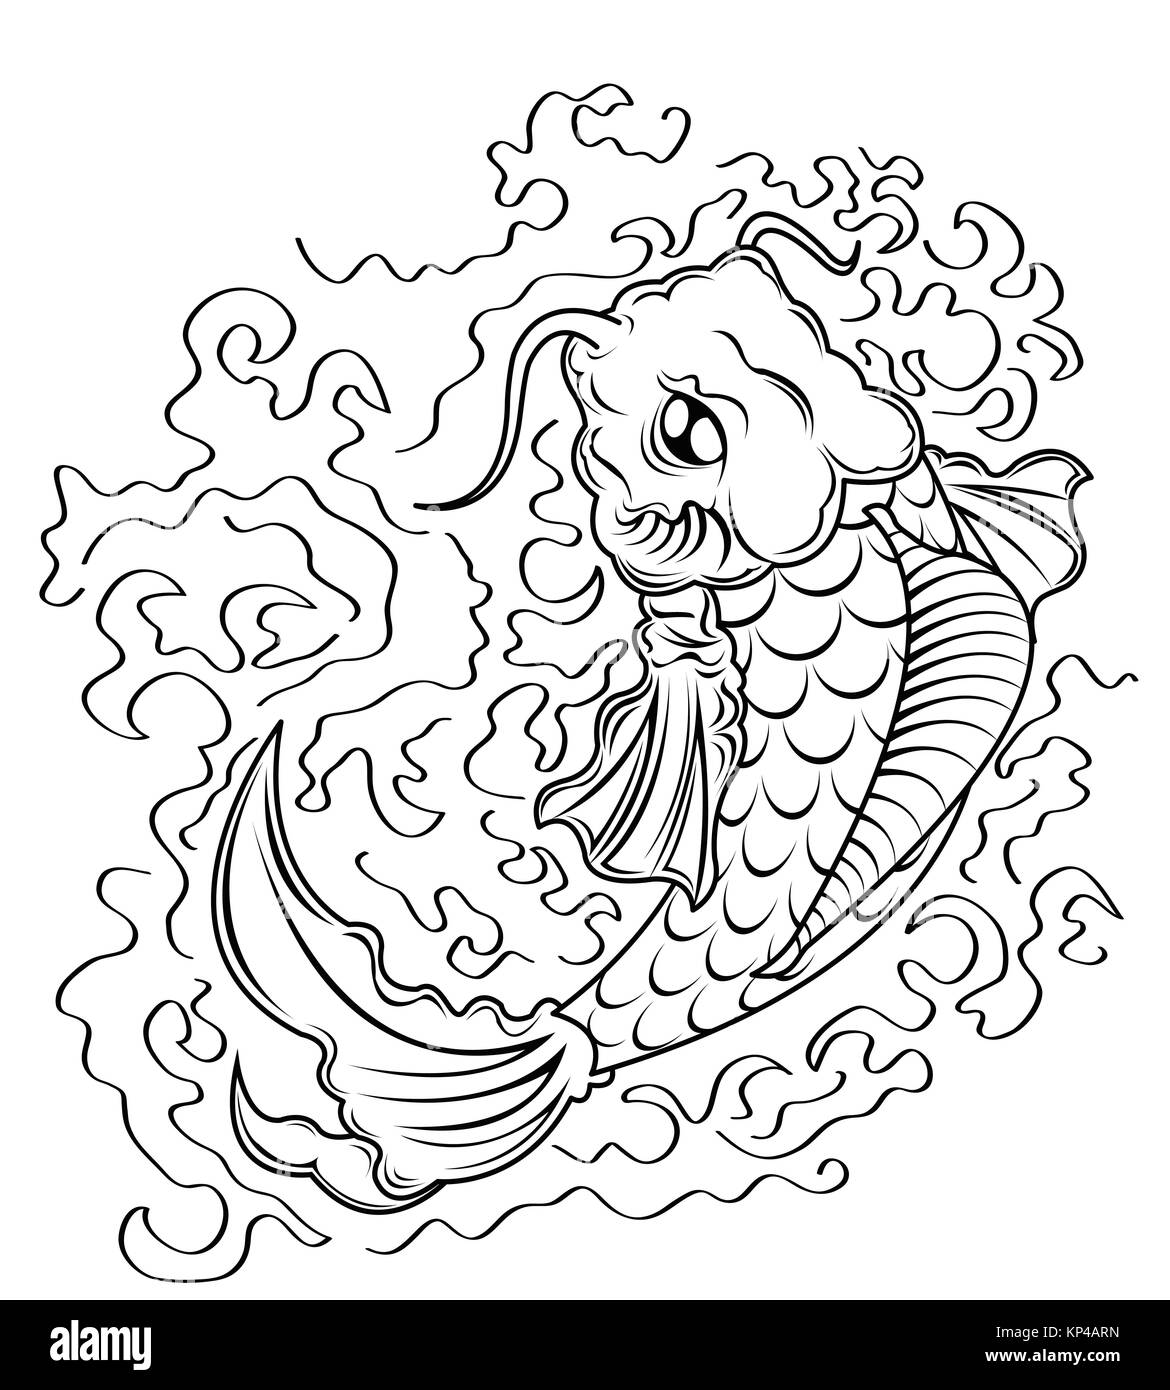 carp black and white stock photos images alamy Nineteenth Century Fishing koi fish vector stock image